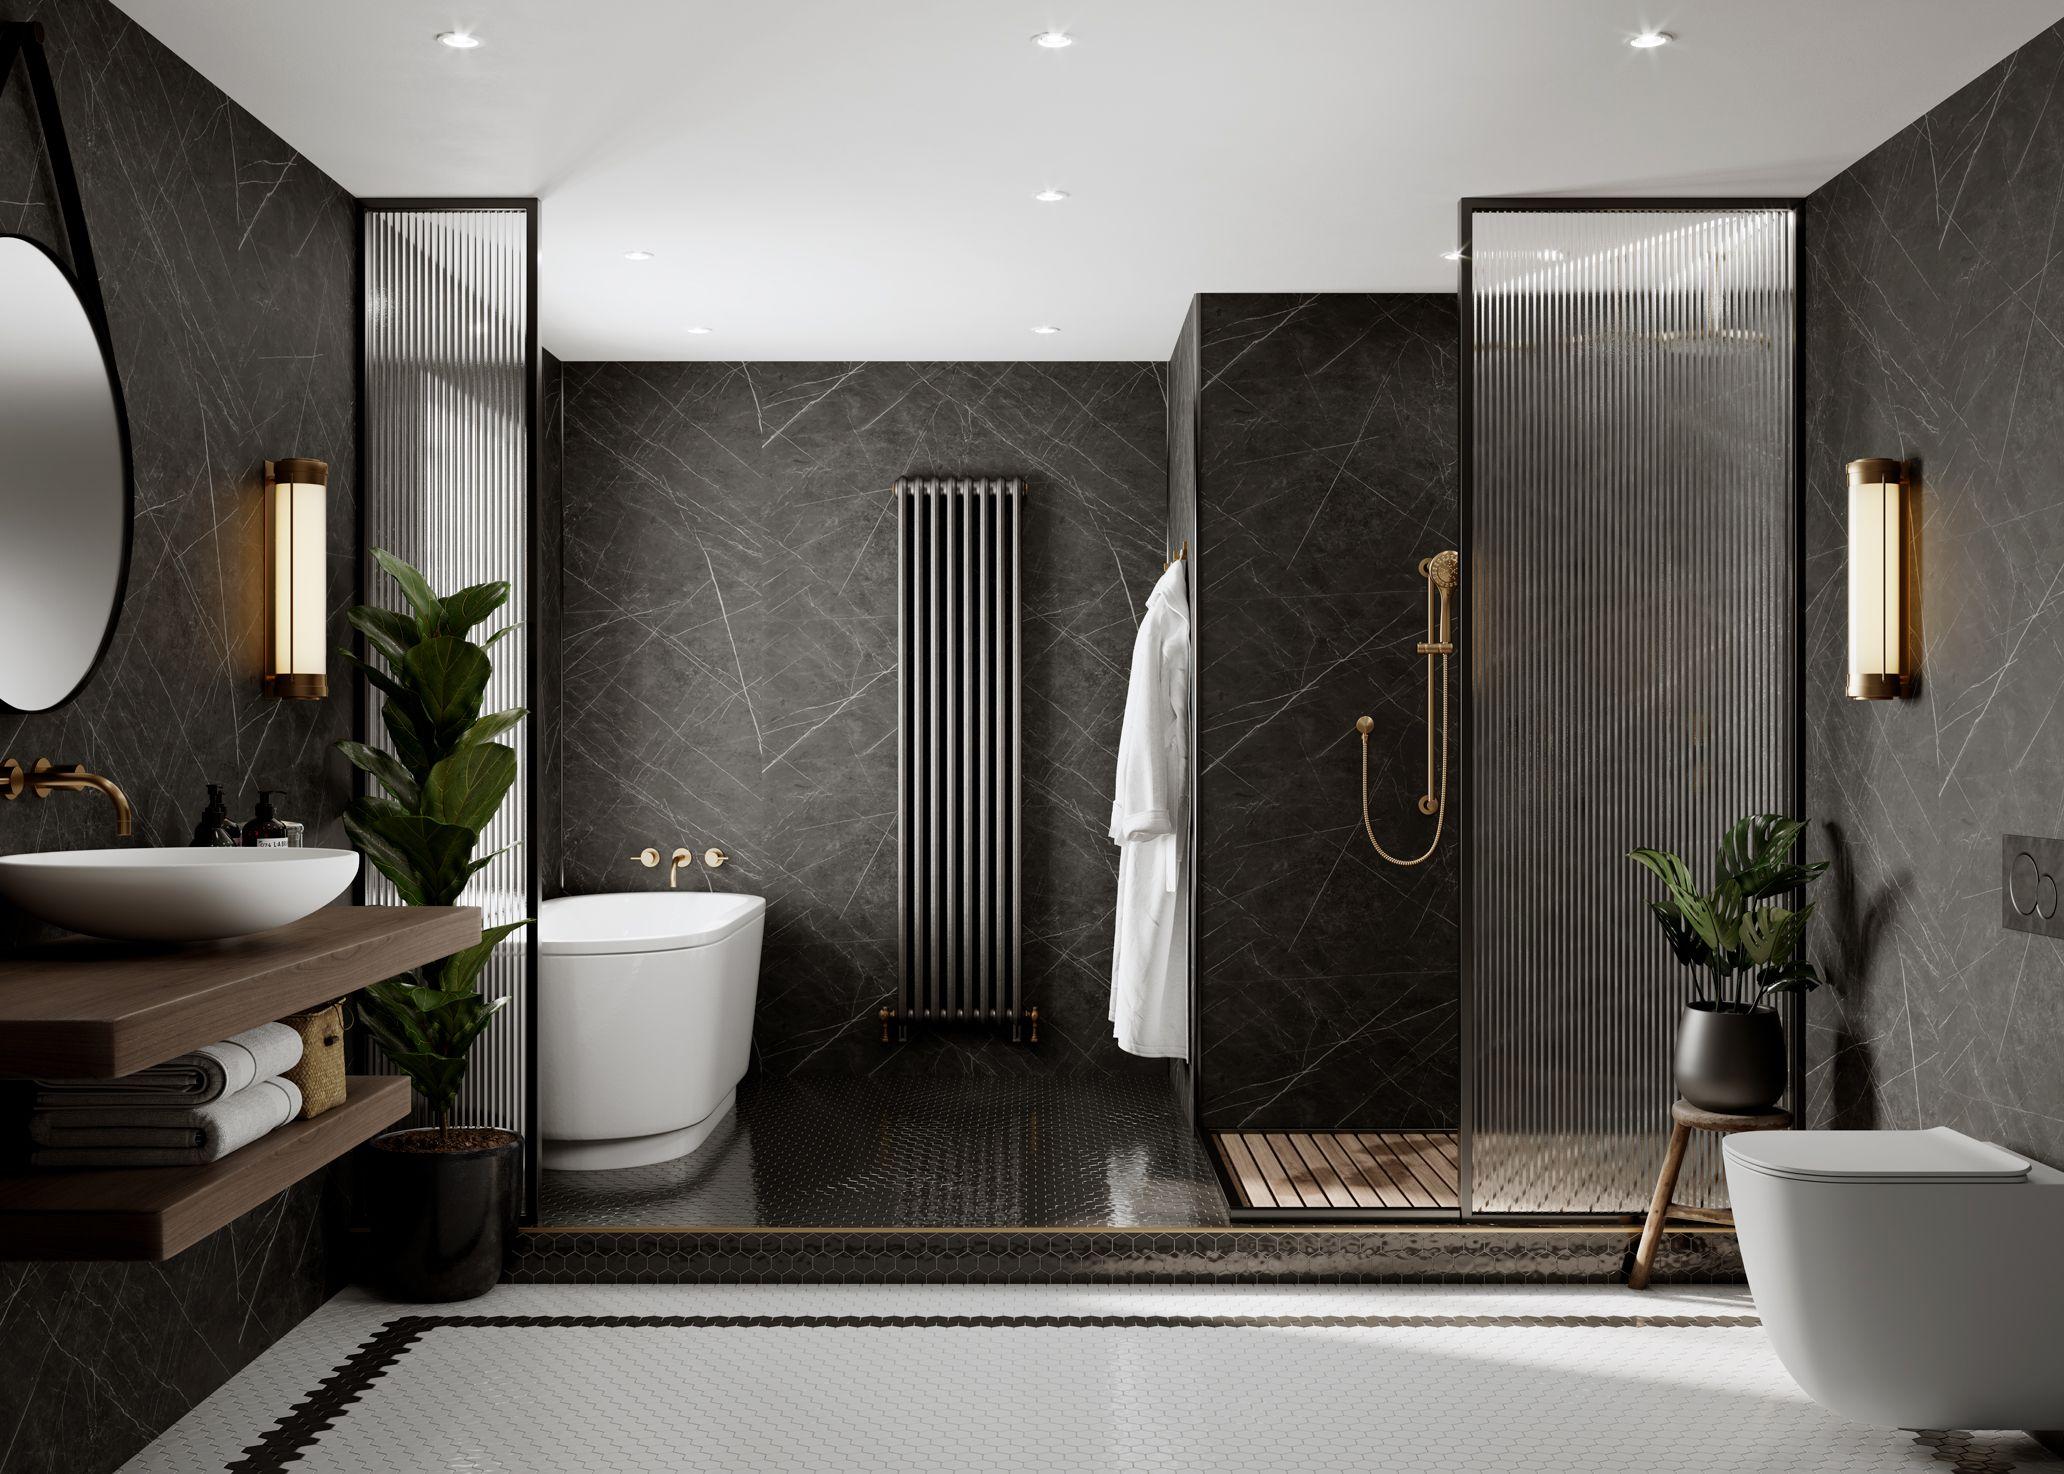 Black Marble Bathrooms In 2020 Black Marble Bathroom Bathroom Design Luxury Hotel Bathroom Design